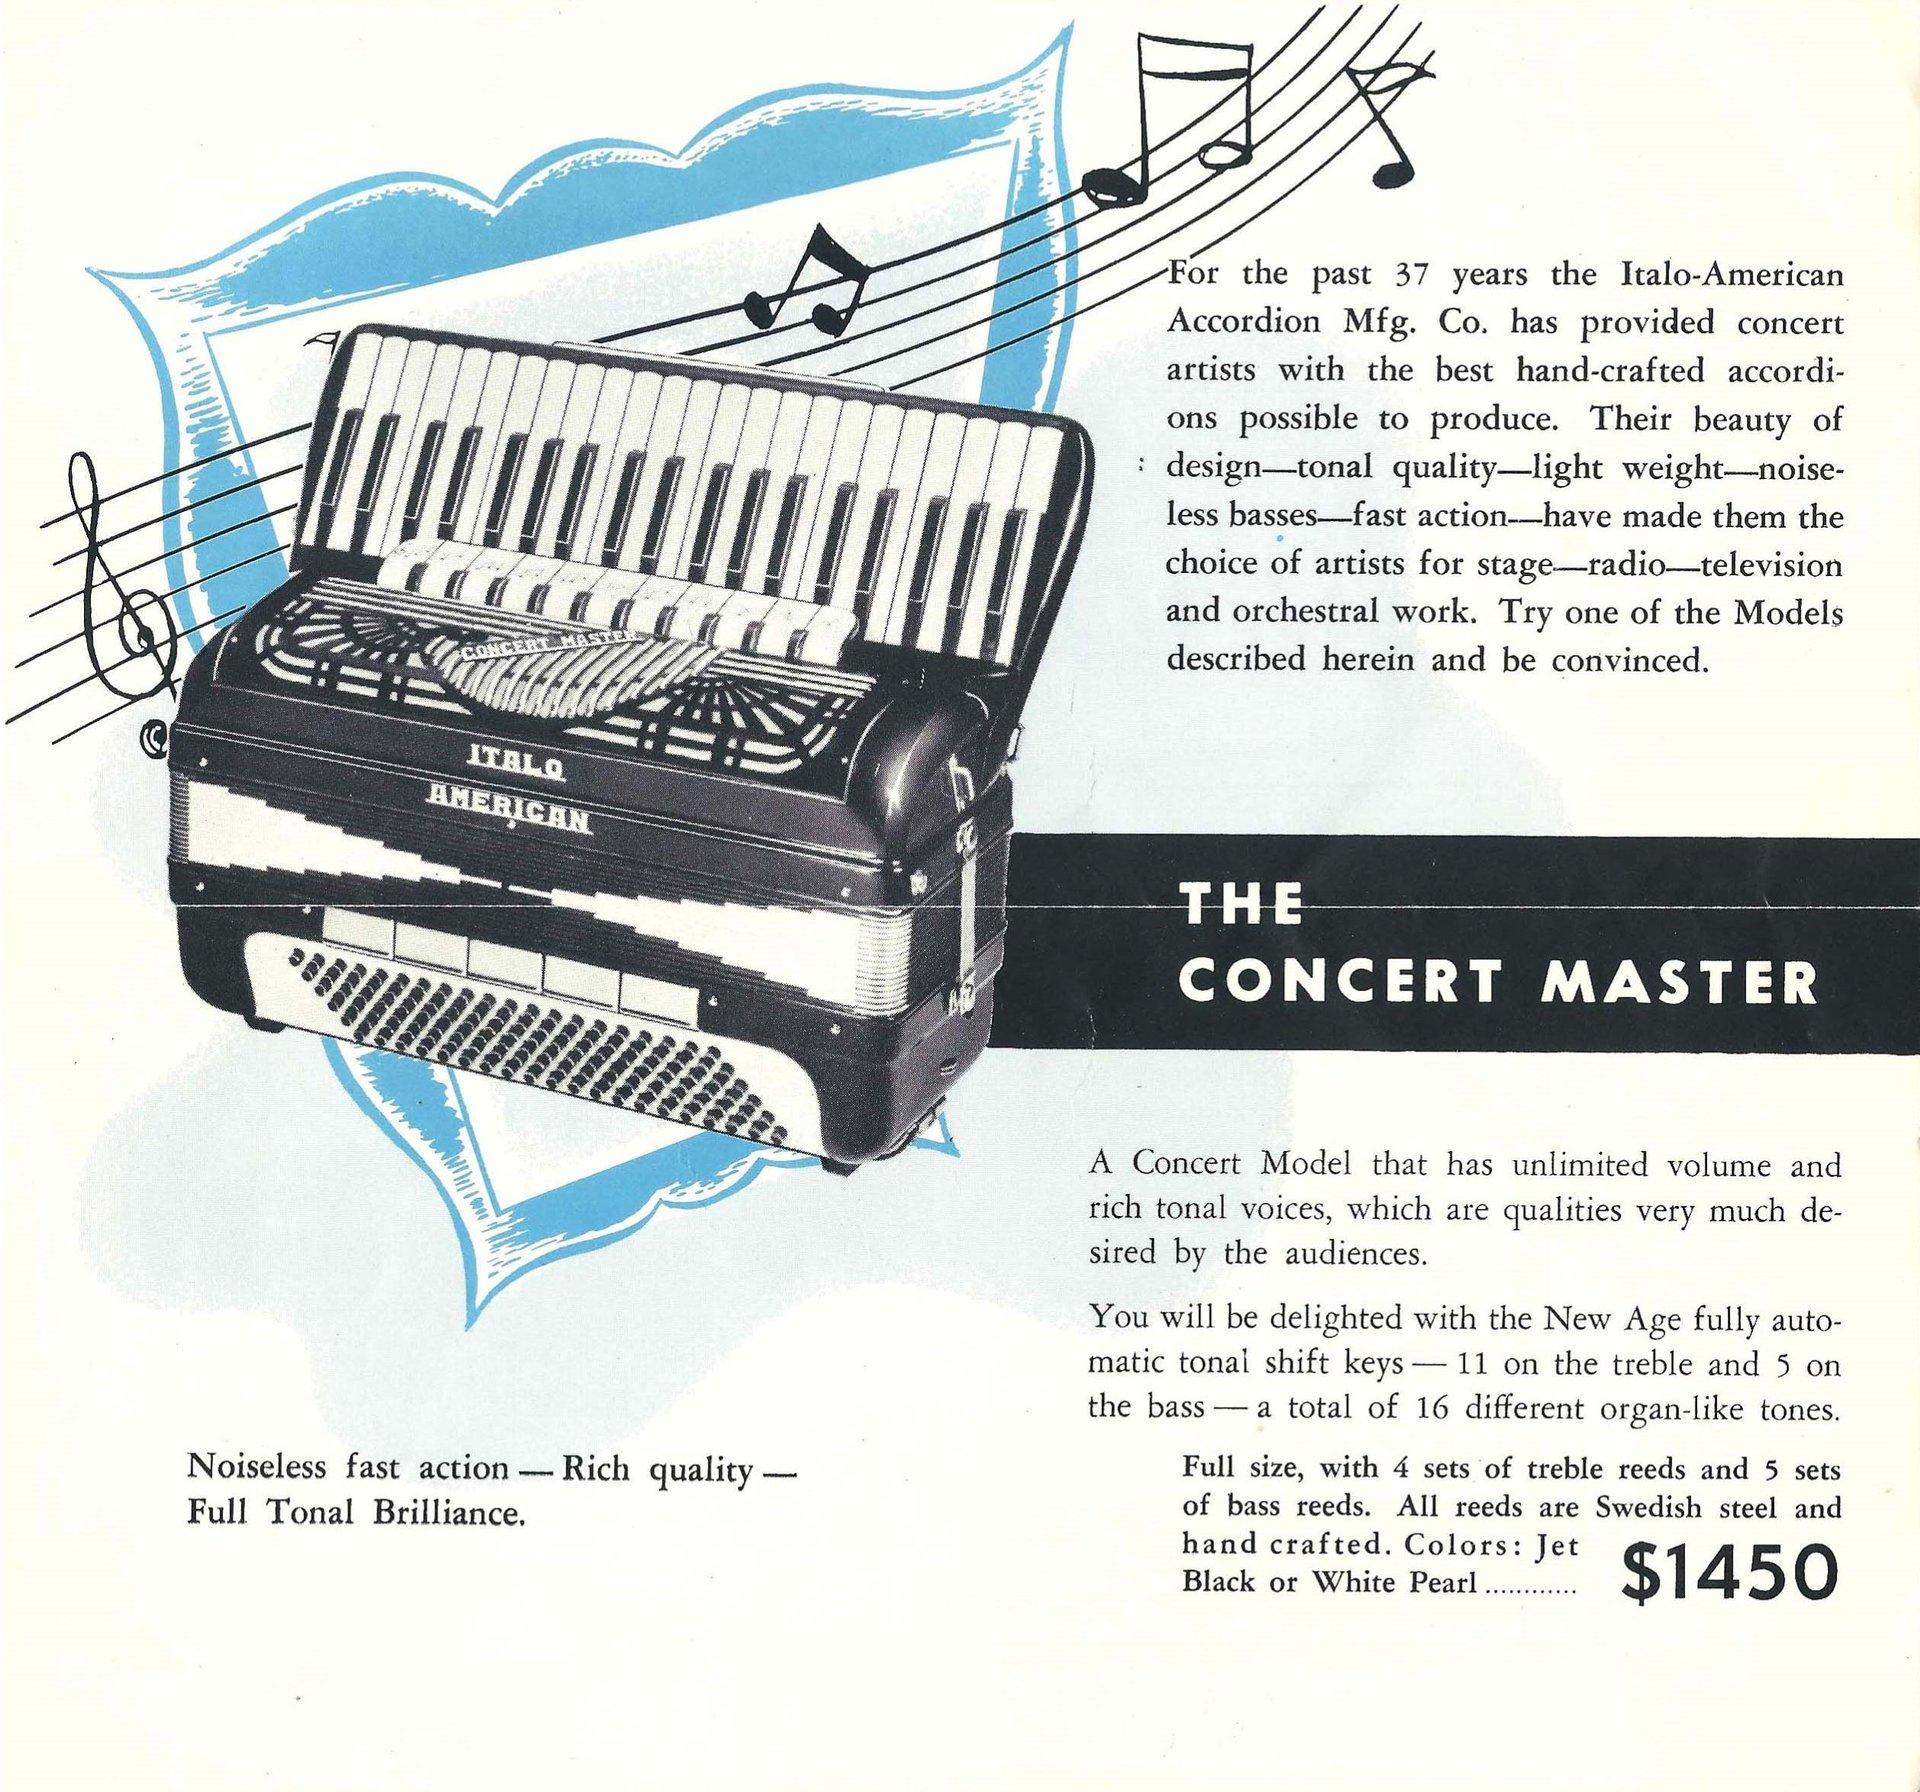 Concert Master Accordion